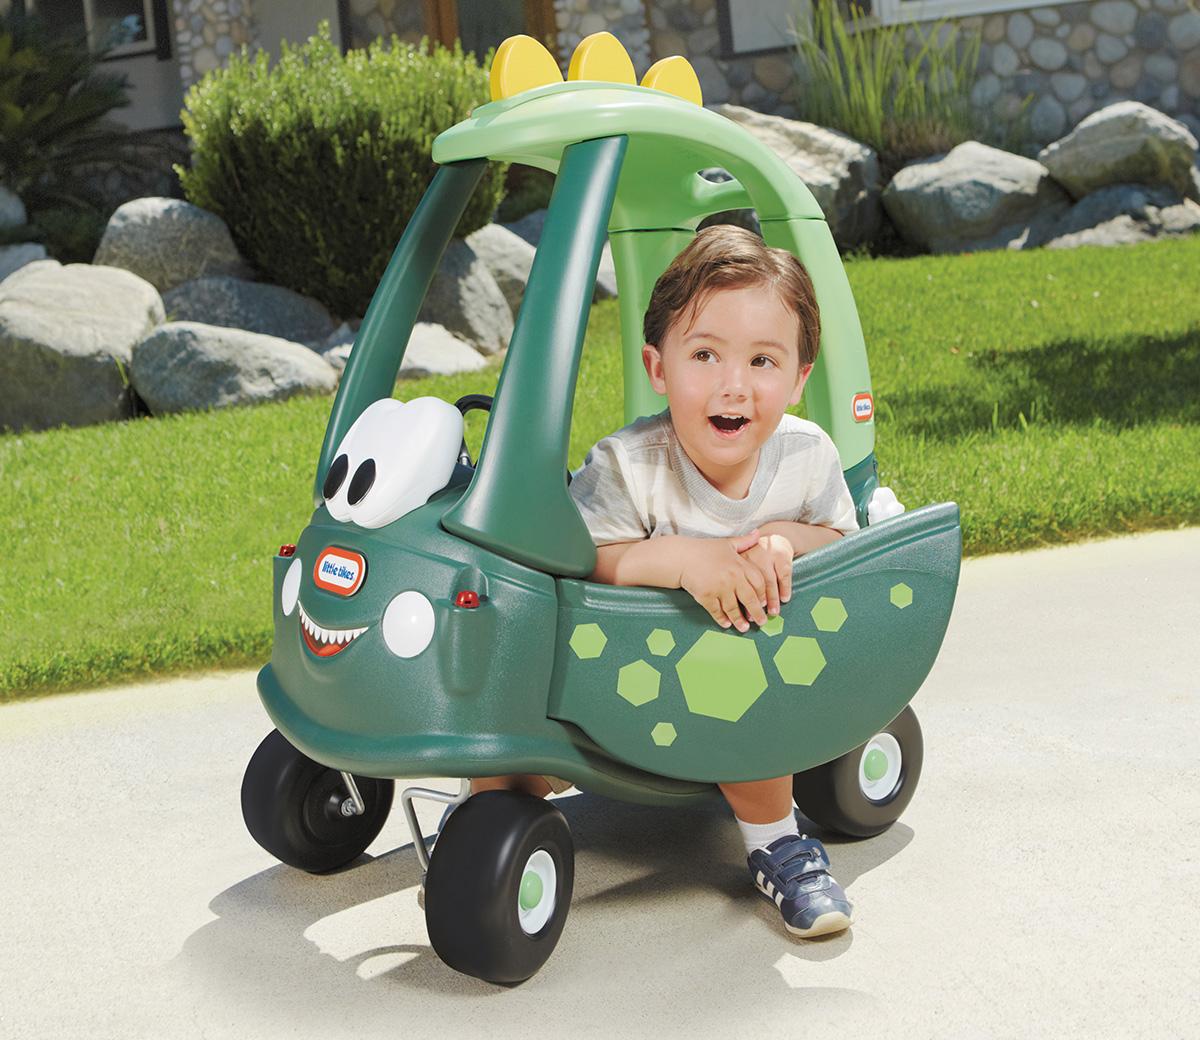 Little Tikes Dino Cozy Coupe Ride-On (173073E3) £34.99 at Amazon